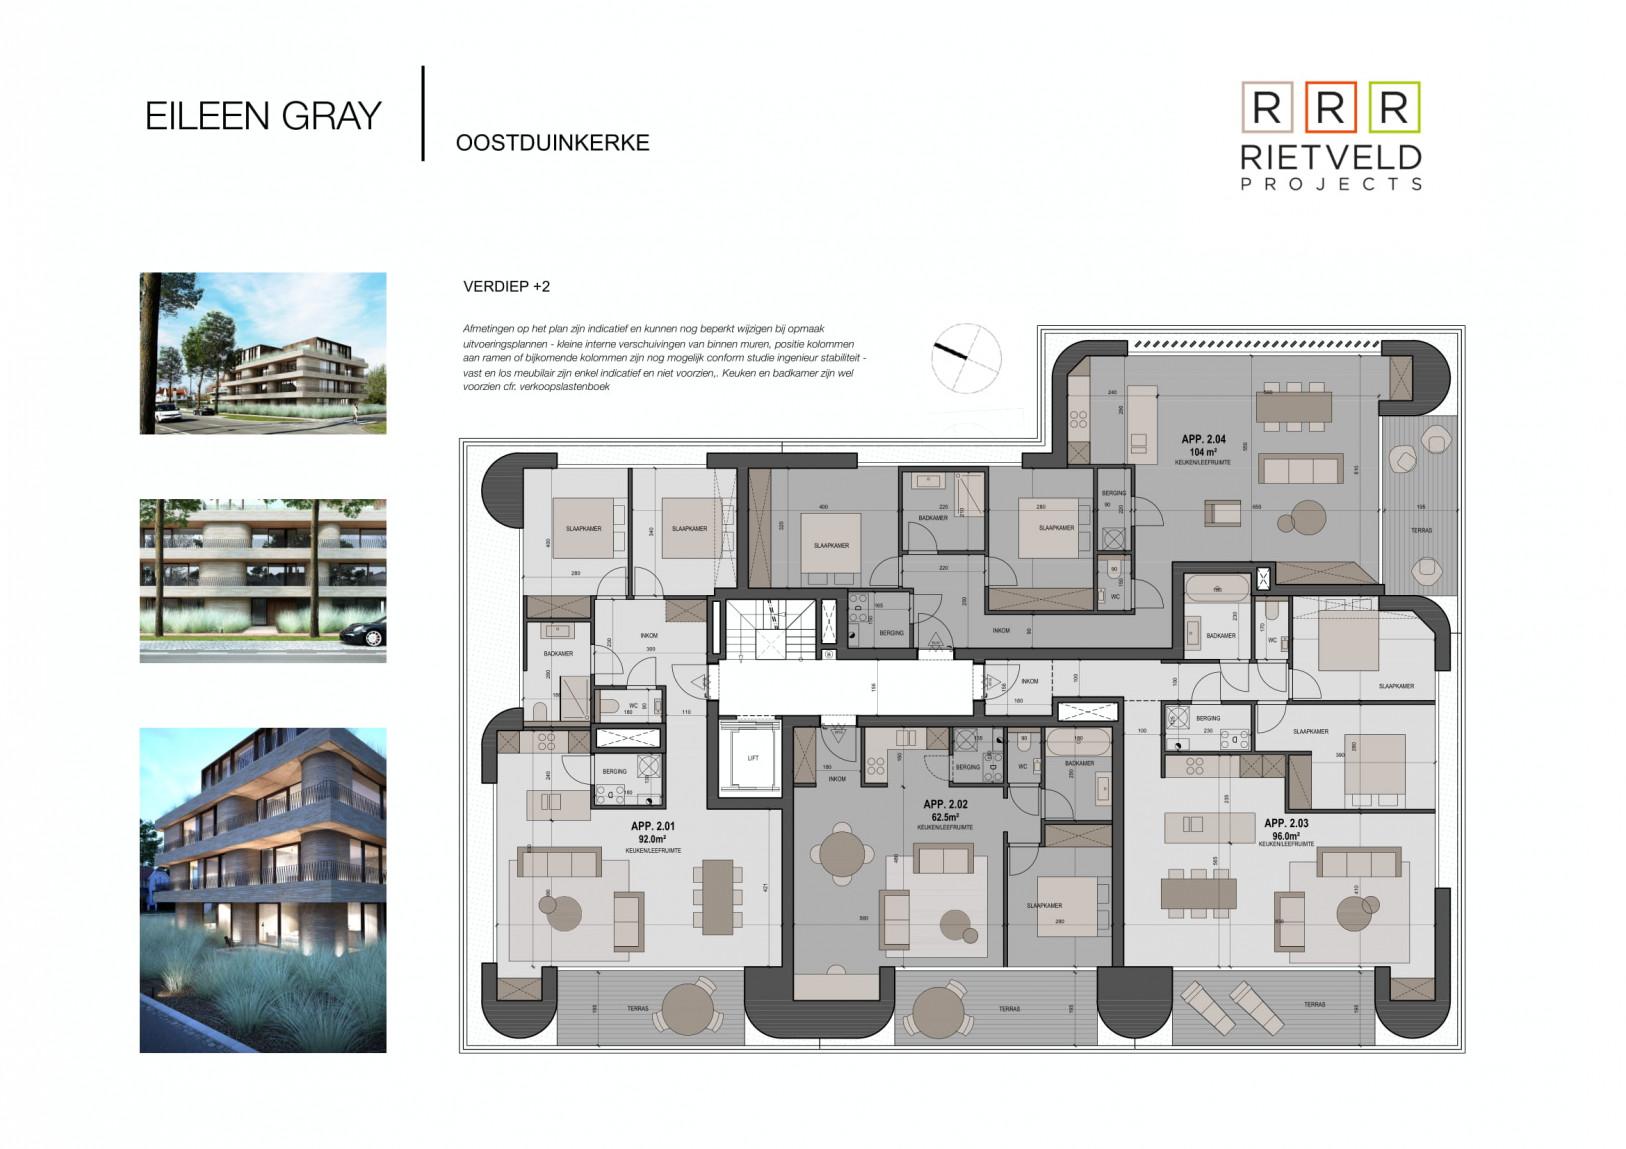 Eileen Gray - Rietveld Projects - Verdiepig 2